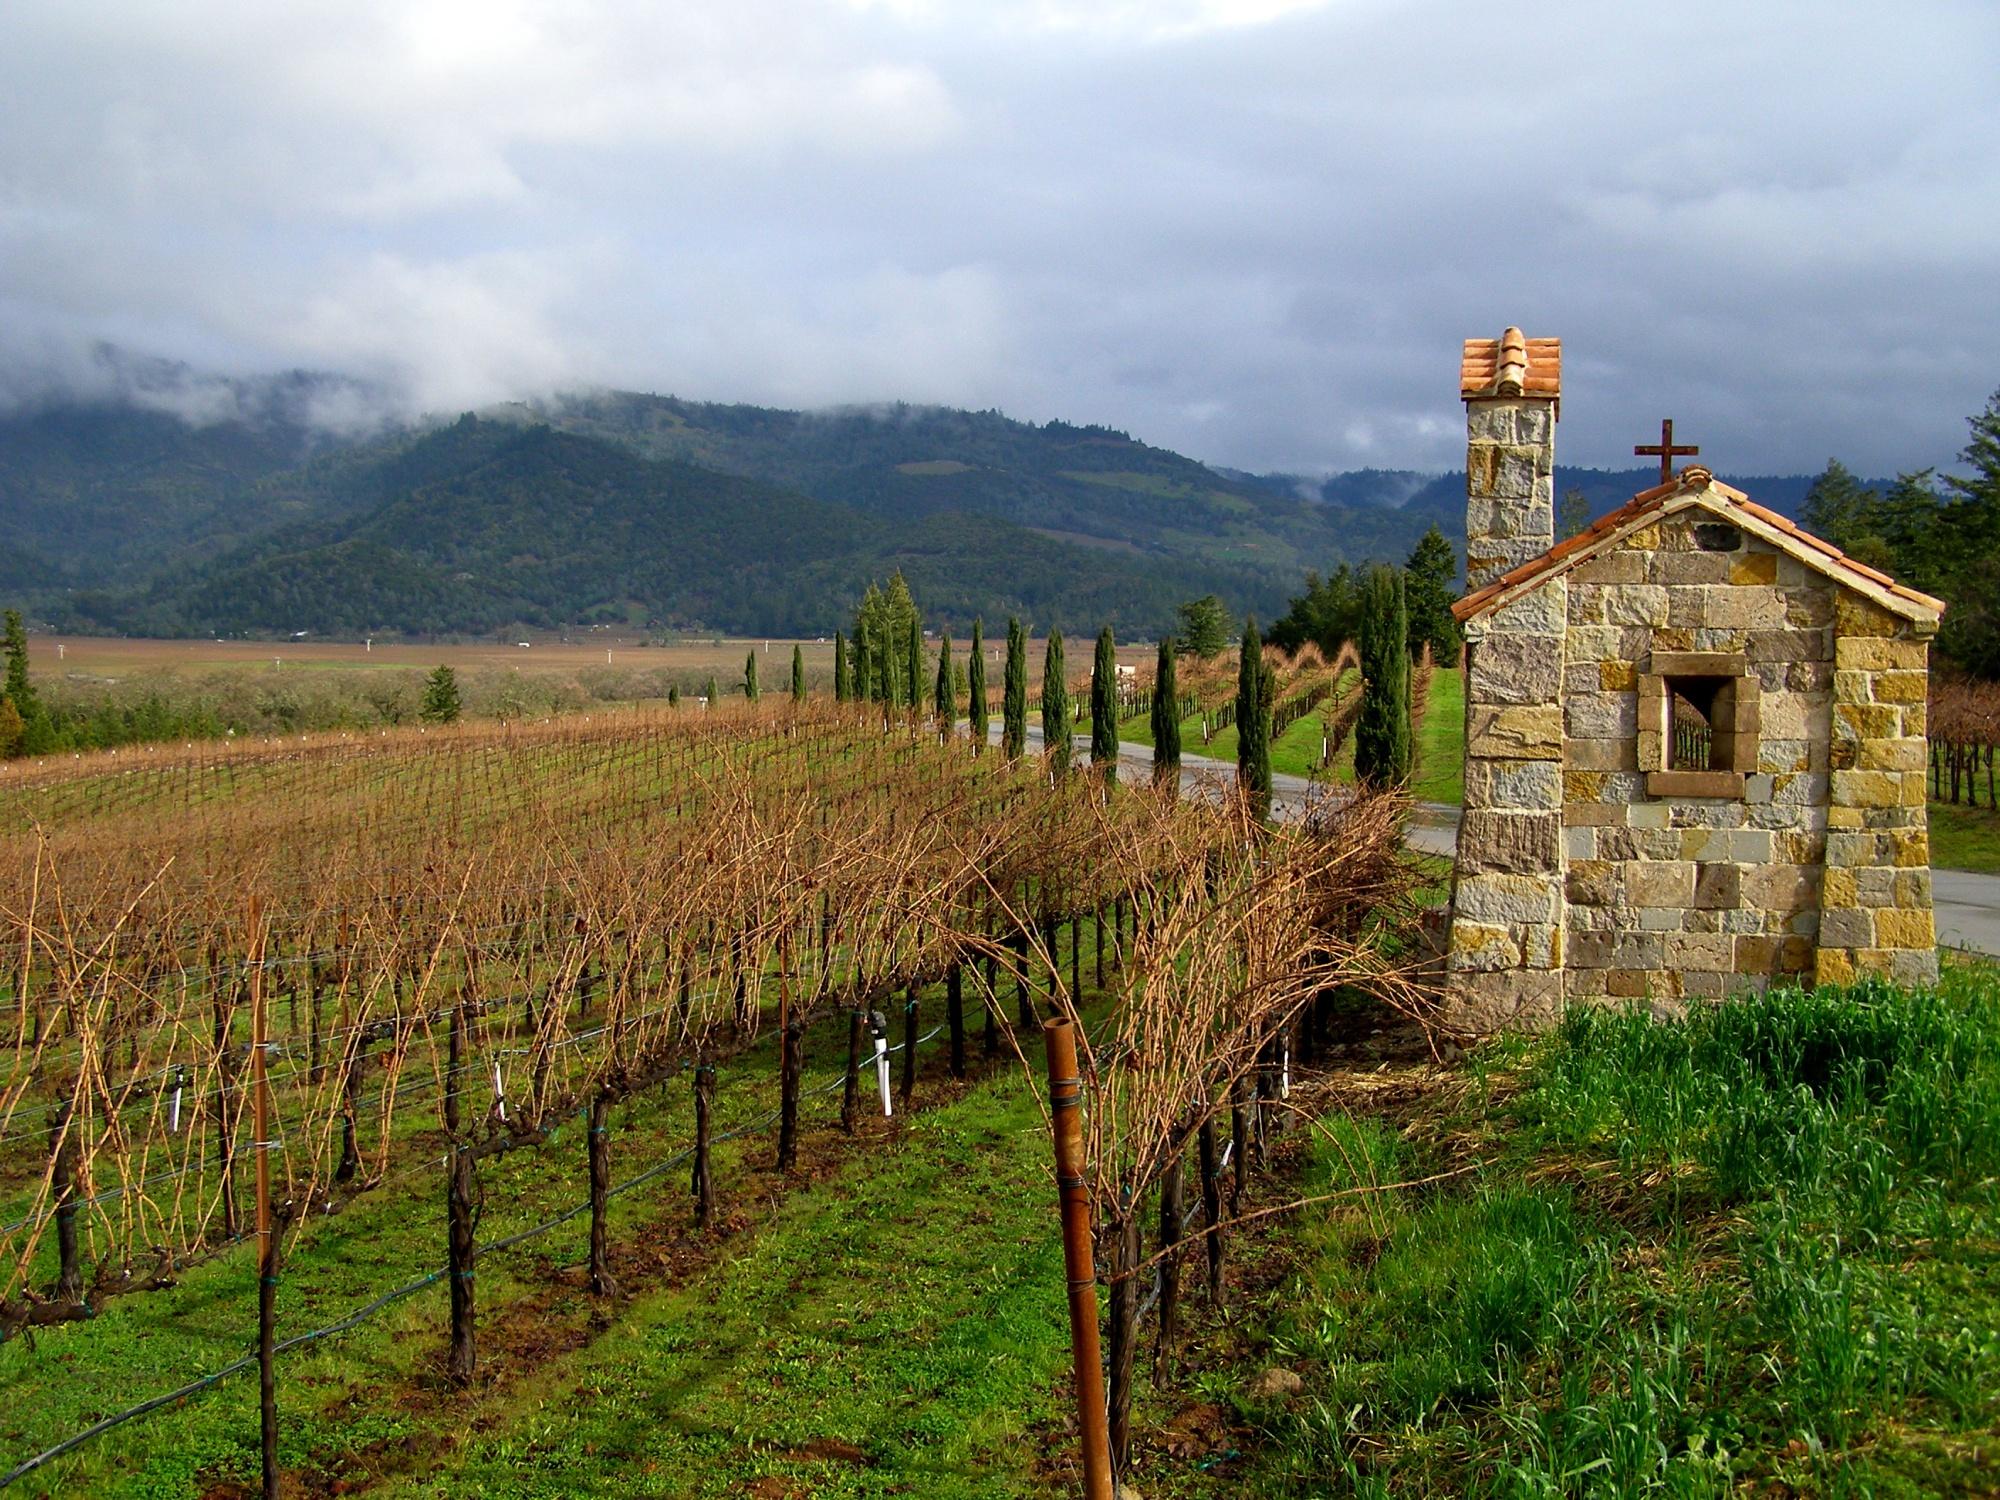 View of Napa Valley from the Gate House of Castello di Amorosa   Dawn Devine ~ davinadevine.me